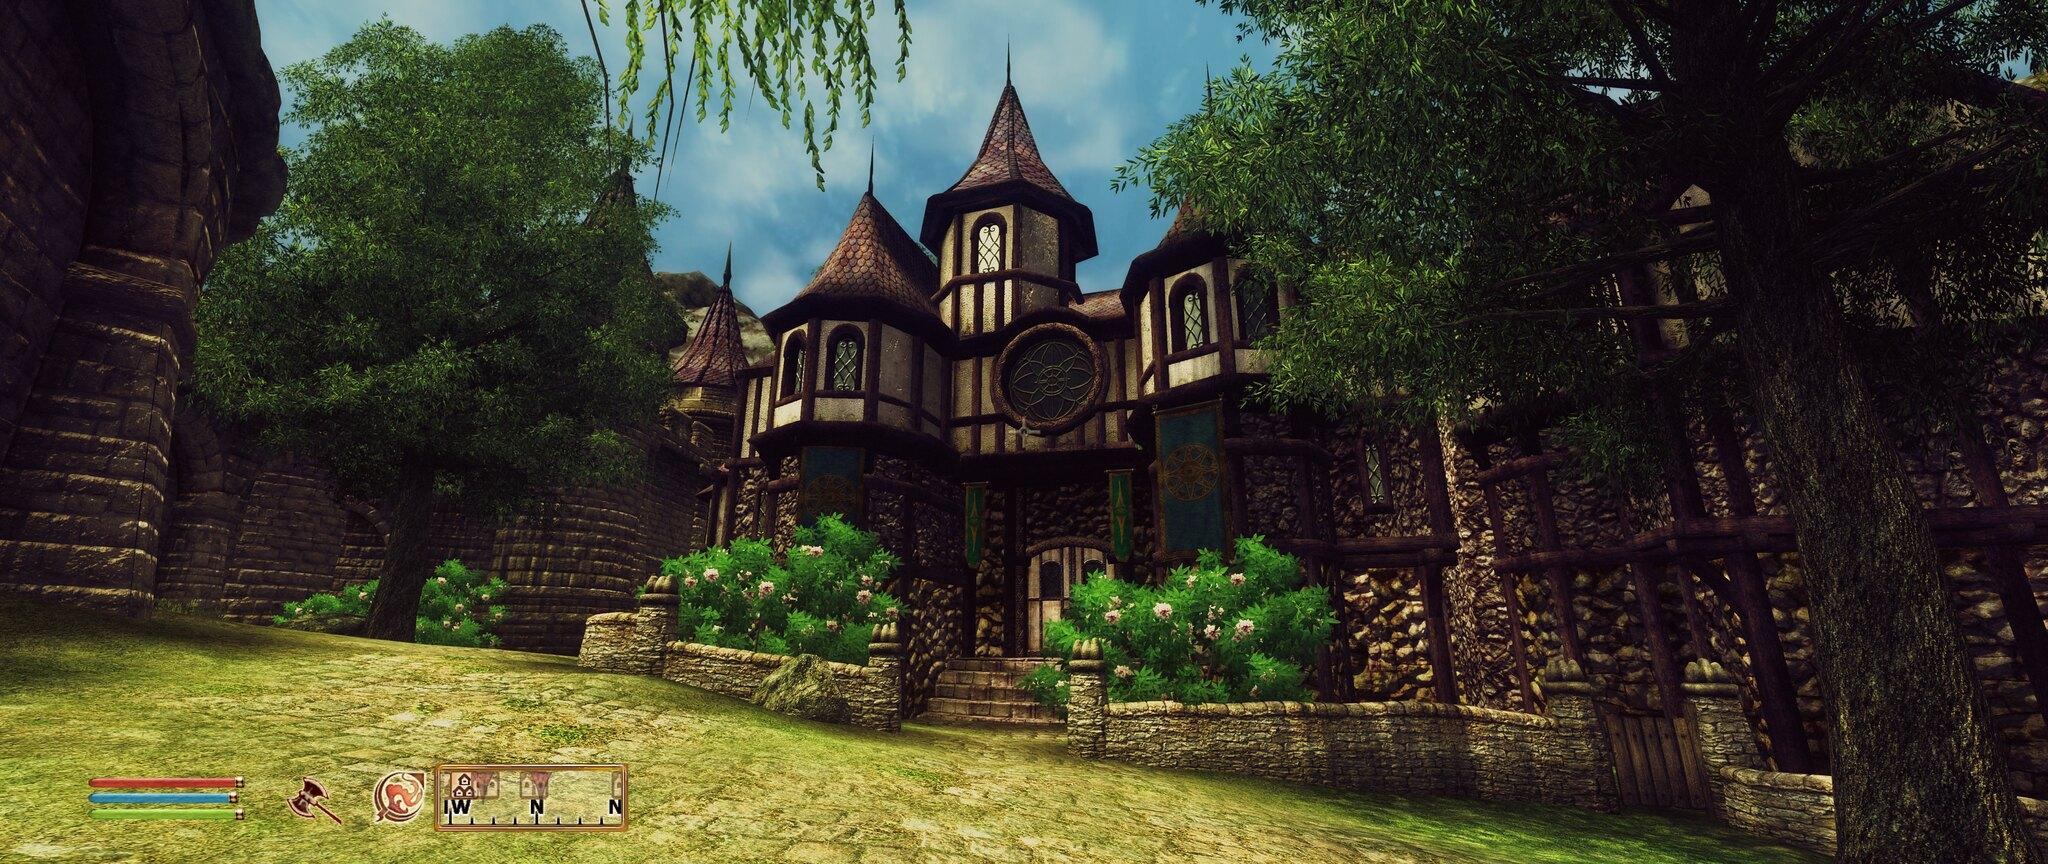 The Elder Scrolls IV: Oblivion is still one of the best RPG games